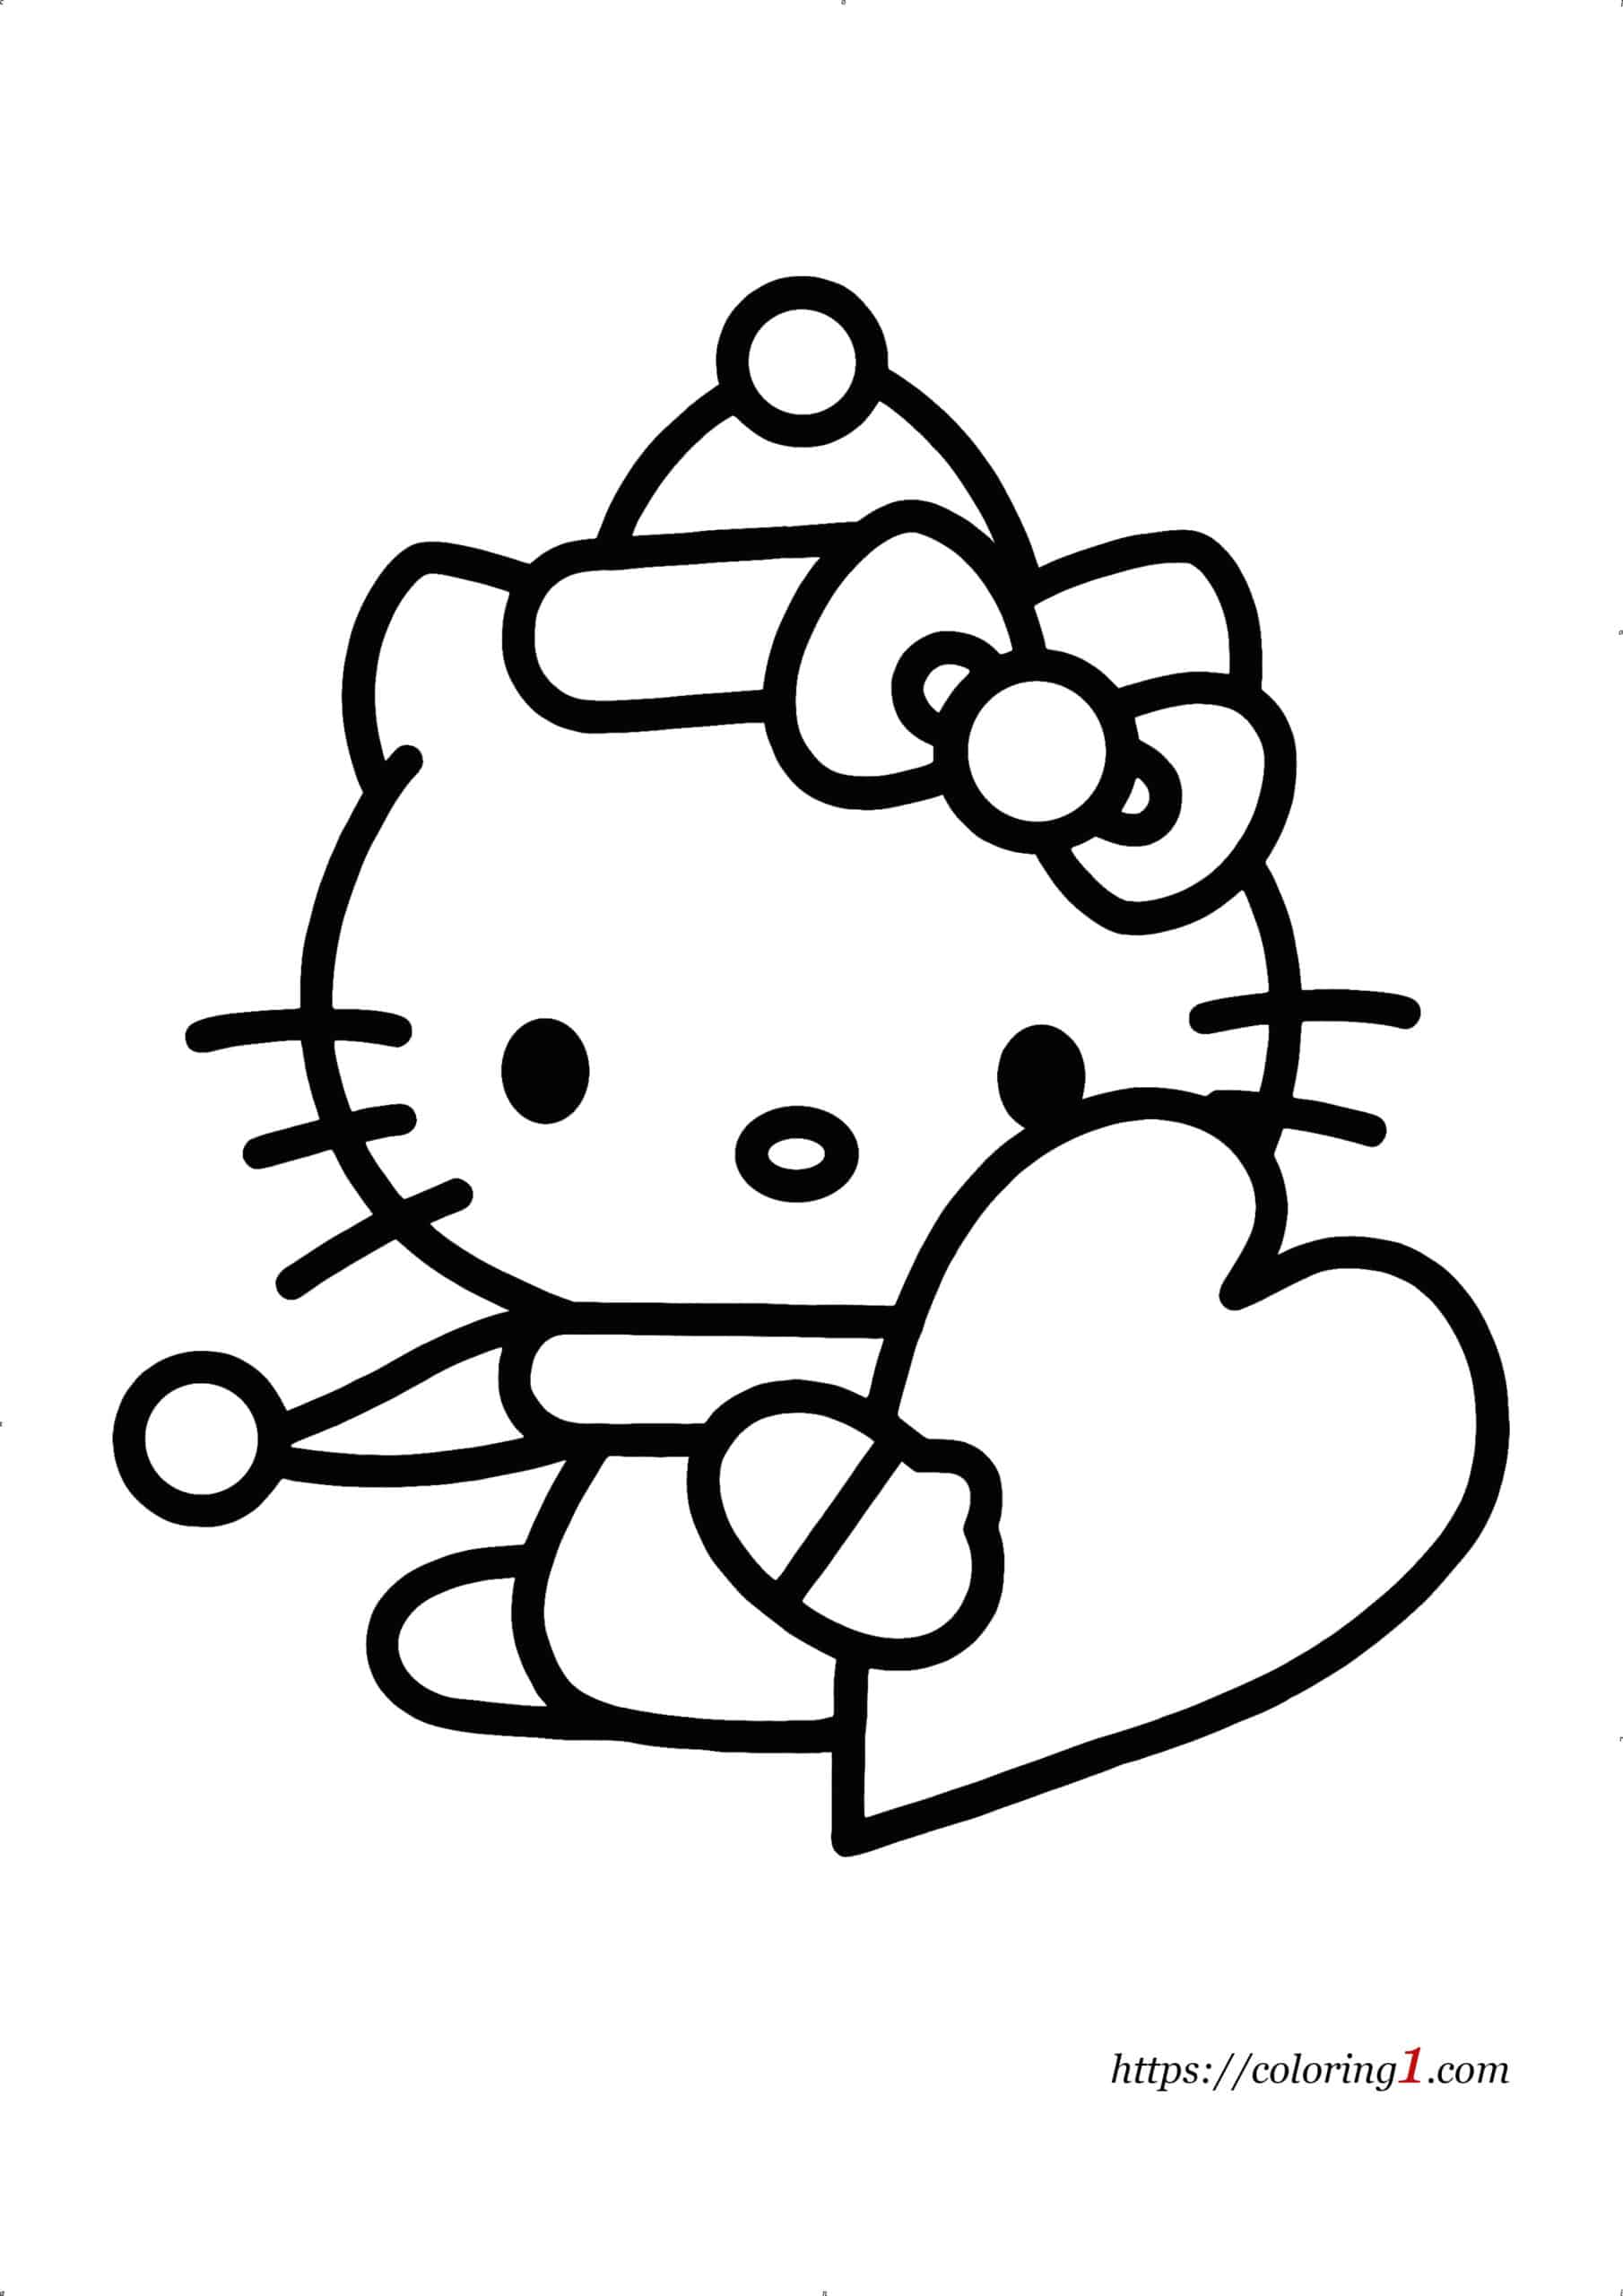 Coloriage Hello Kitty avec Coeur